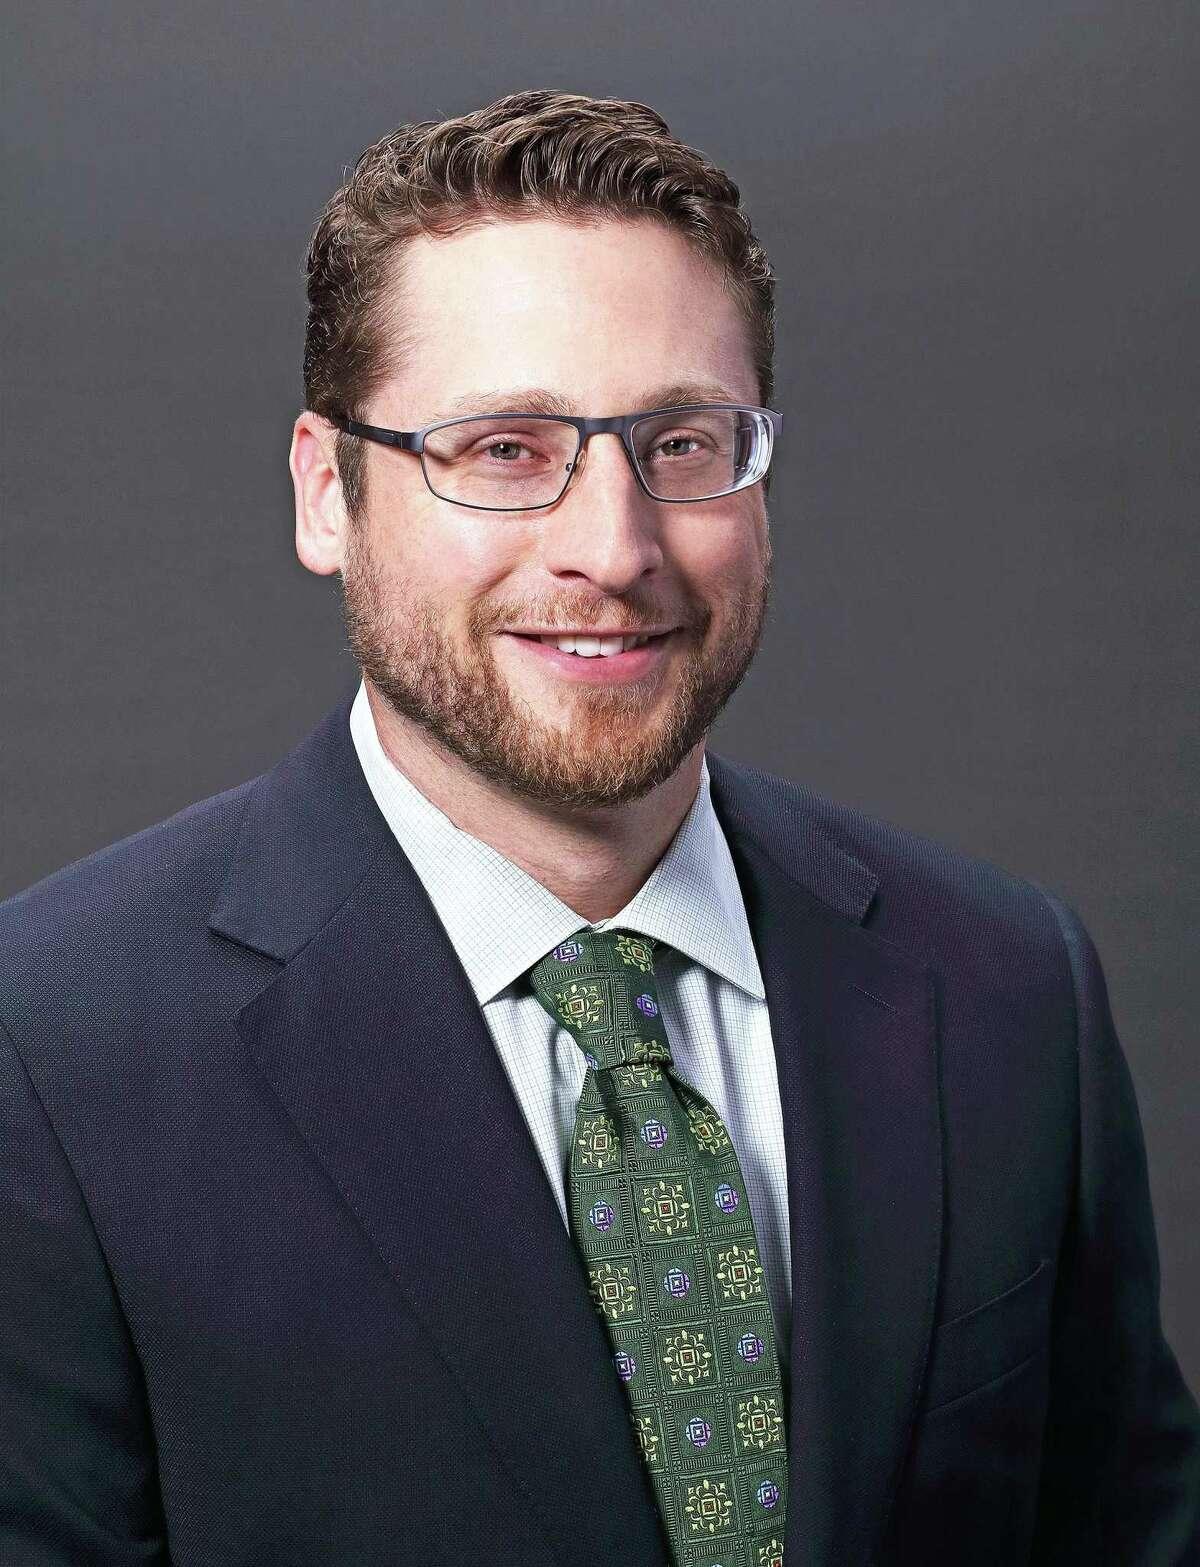 Matt Zeve, deputy director, Harris County Flood Control District